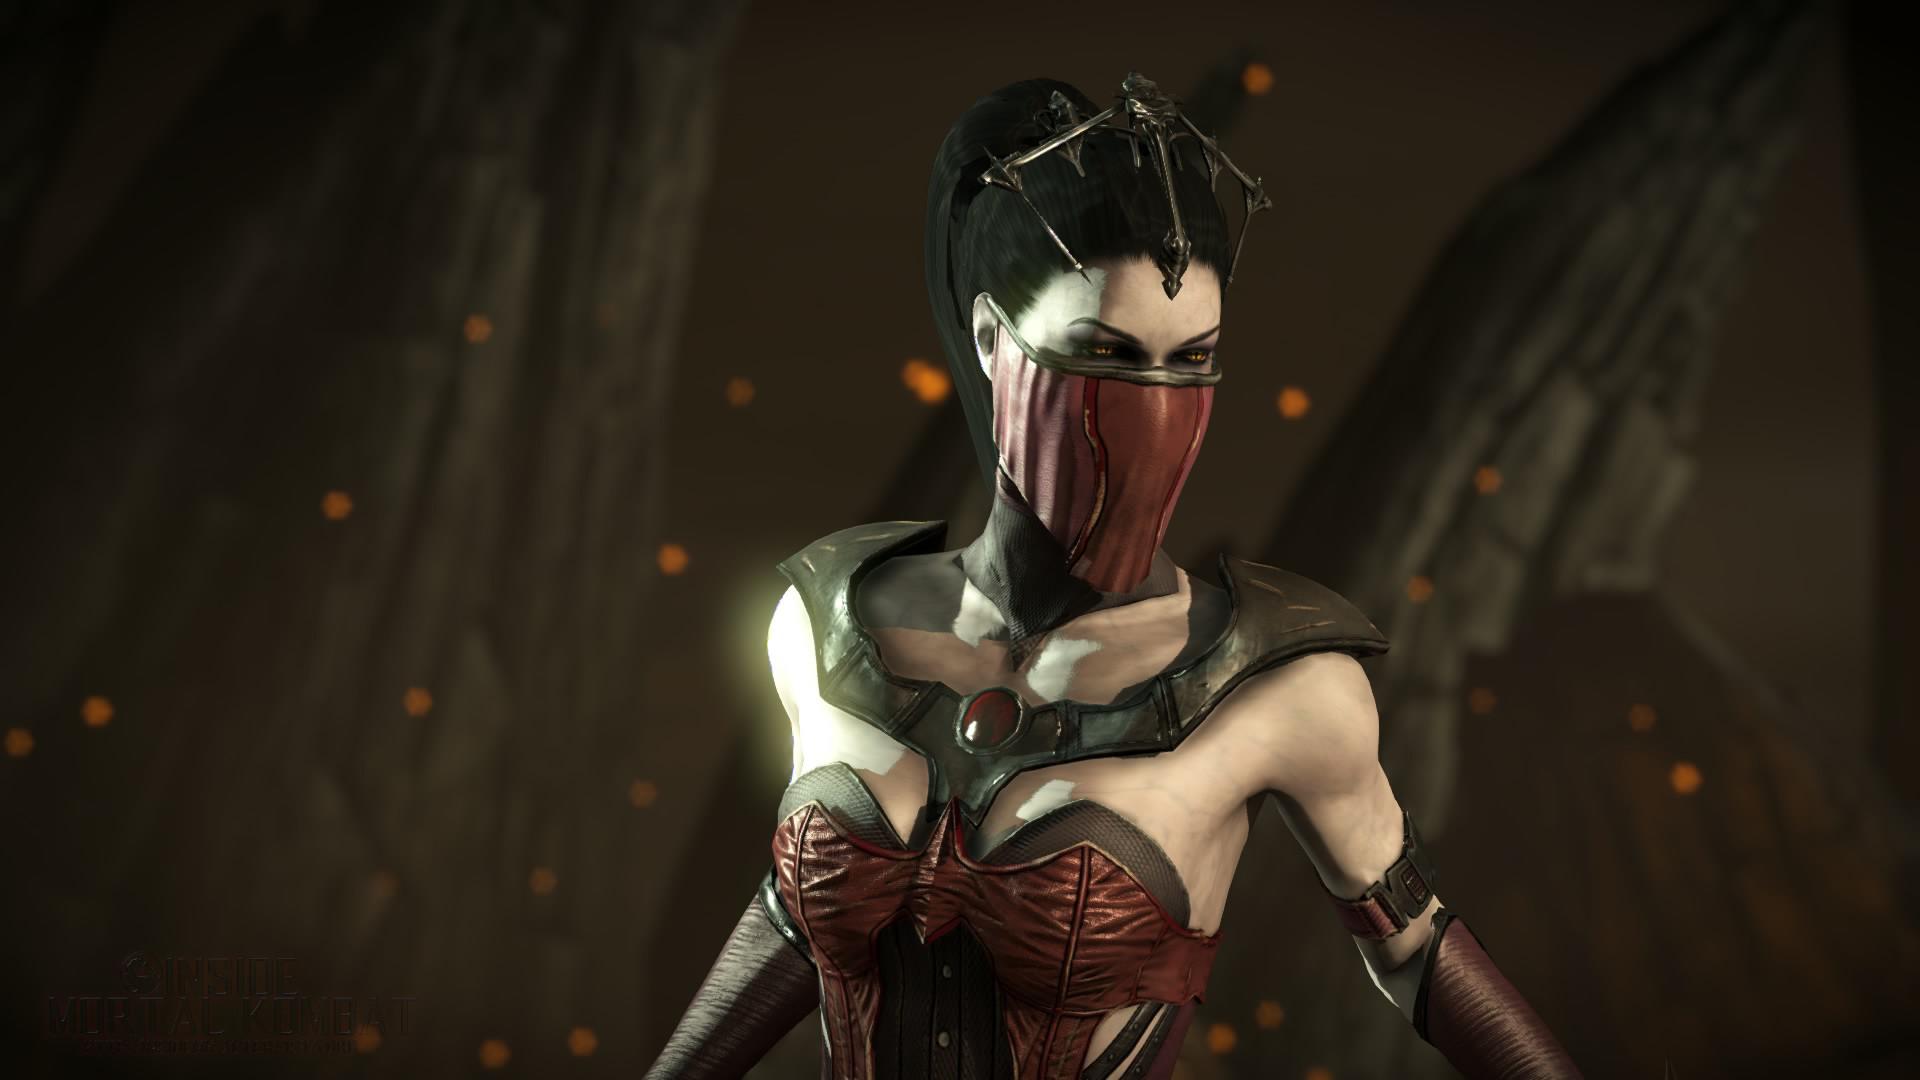 … Mortal-Kombat-X Milena Vampiress 2 by kebzuref